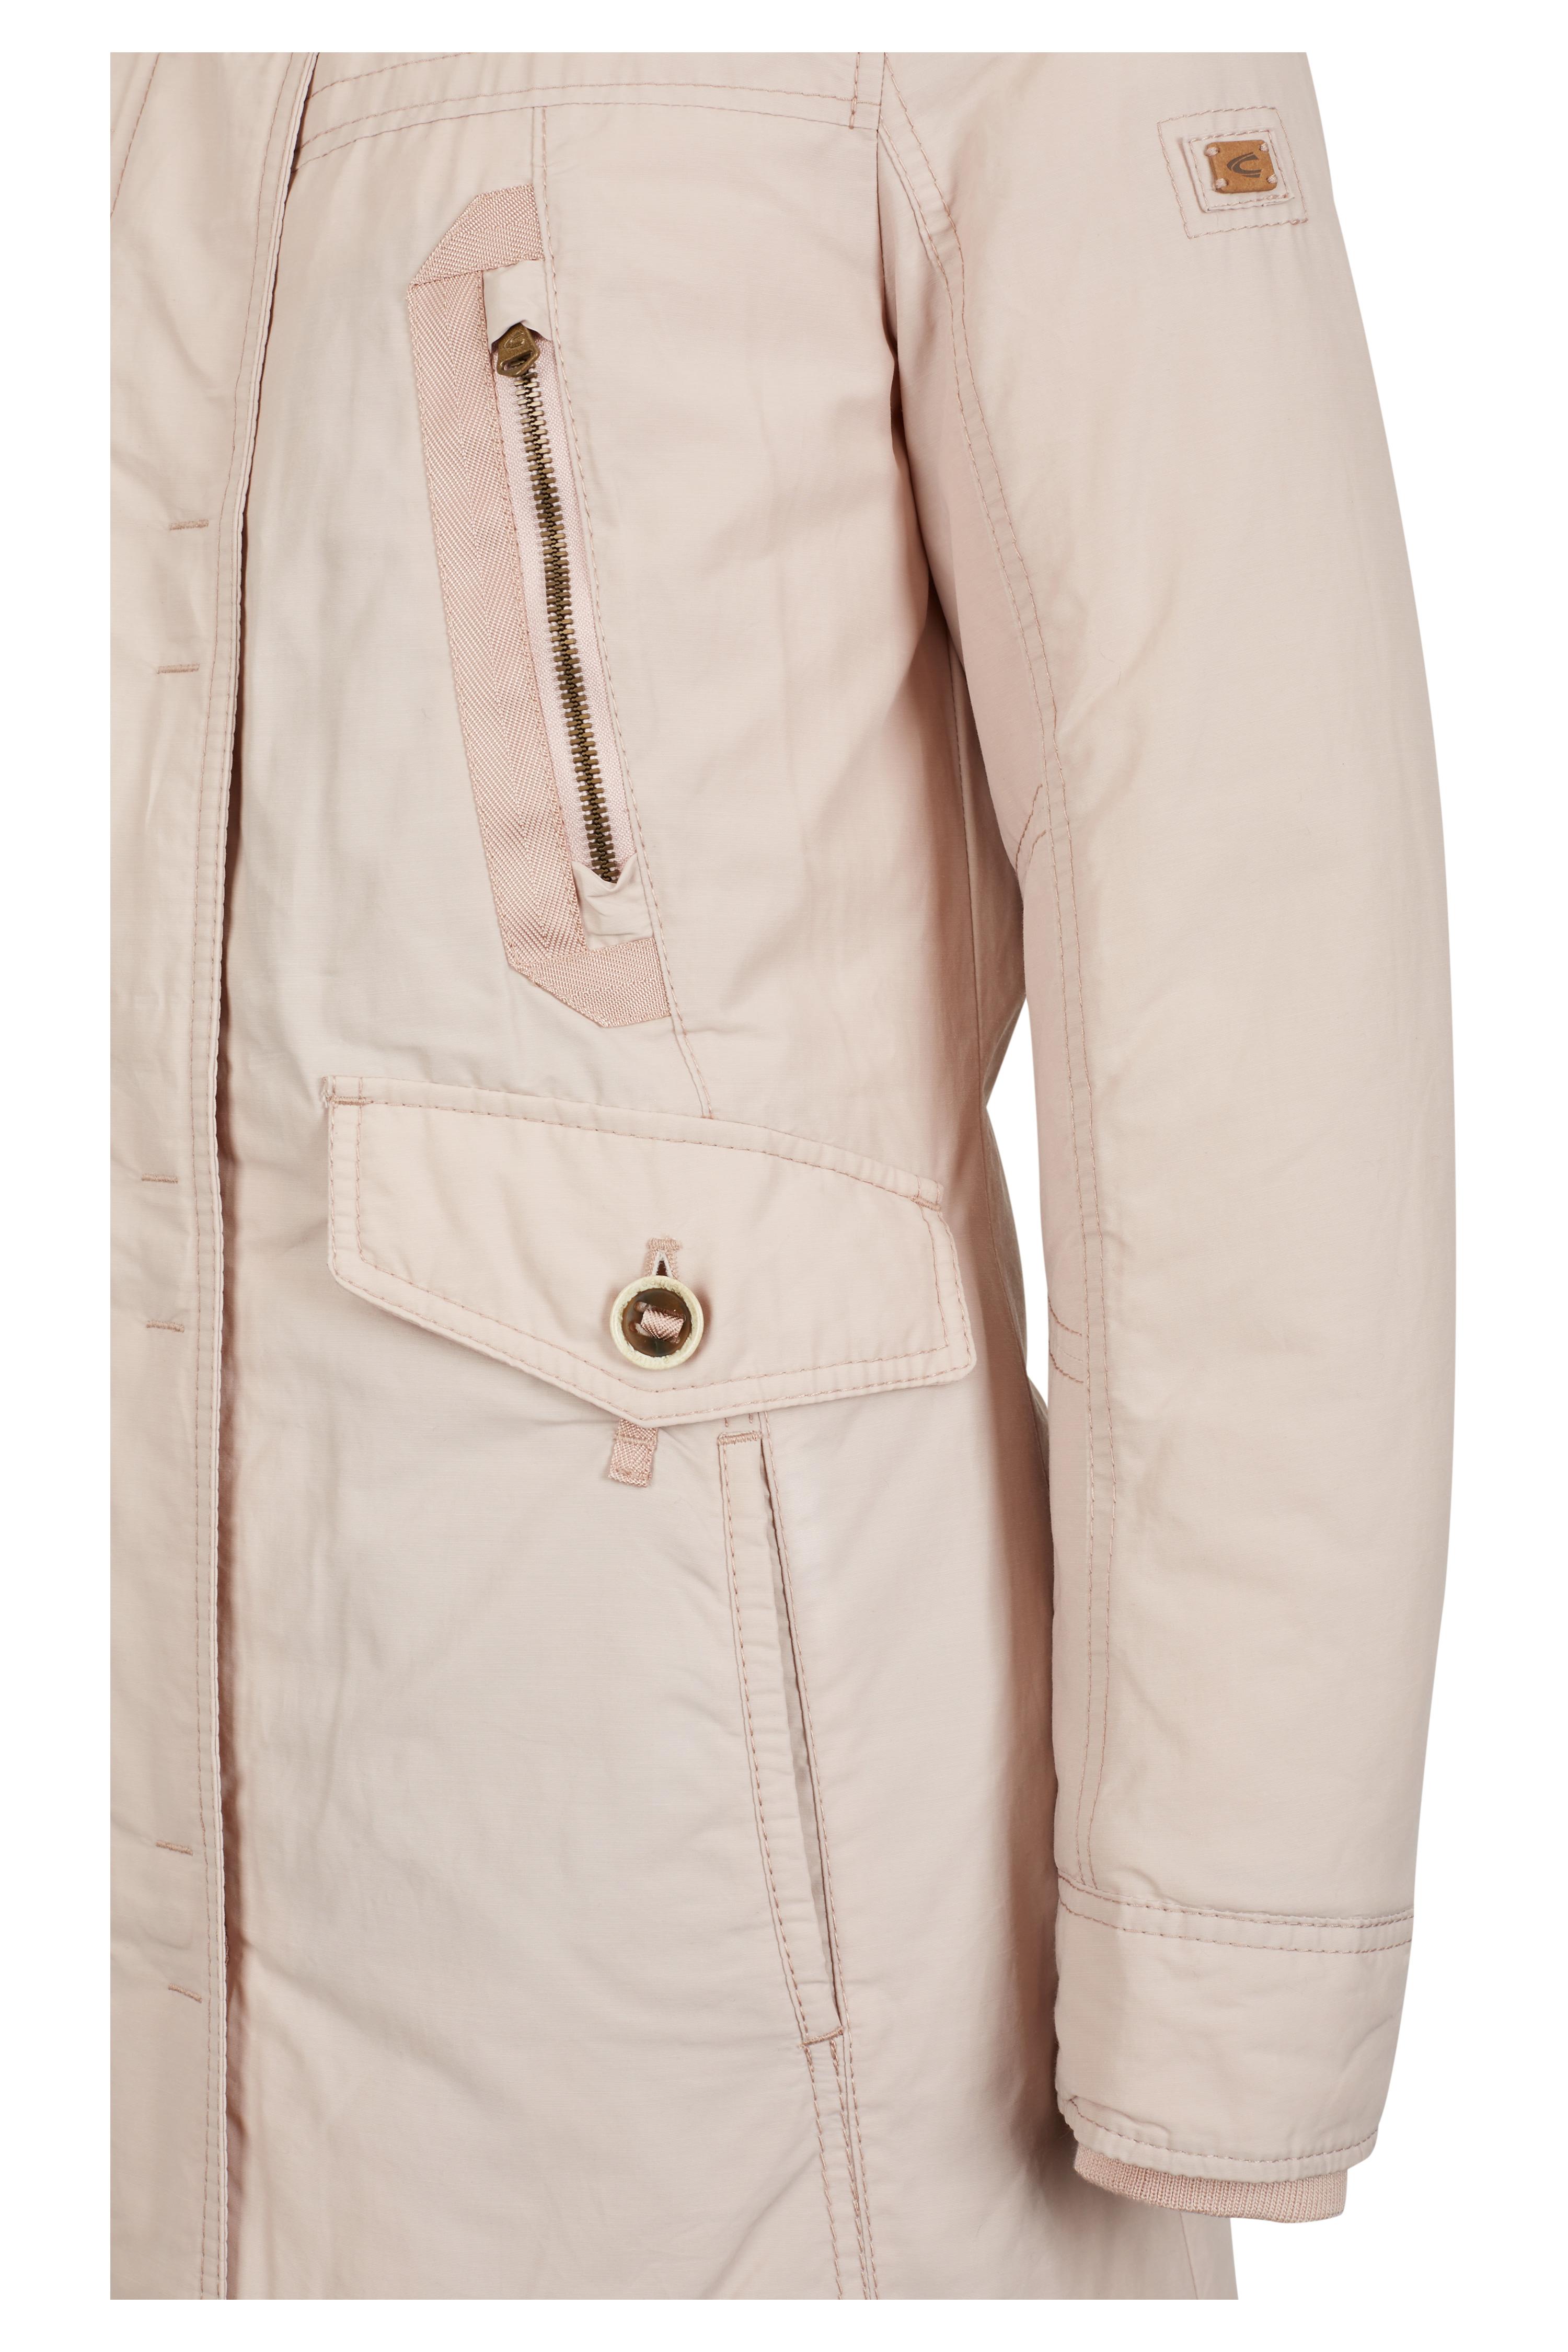 camel active damen mantel mit abnehmbarer kapuze blau khaki beige wei neu ebay. Black Bedroom Furniture Sets. Home Design Ideas